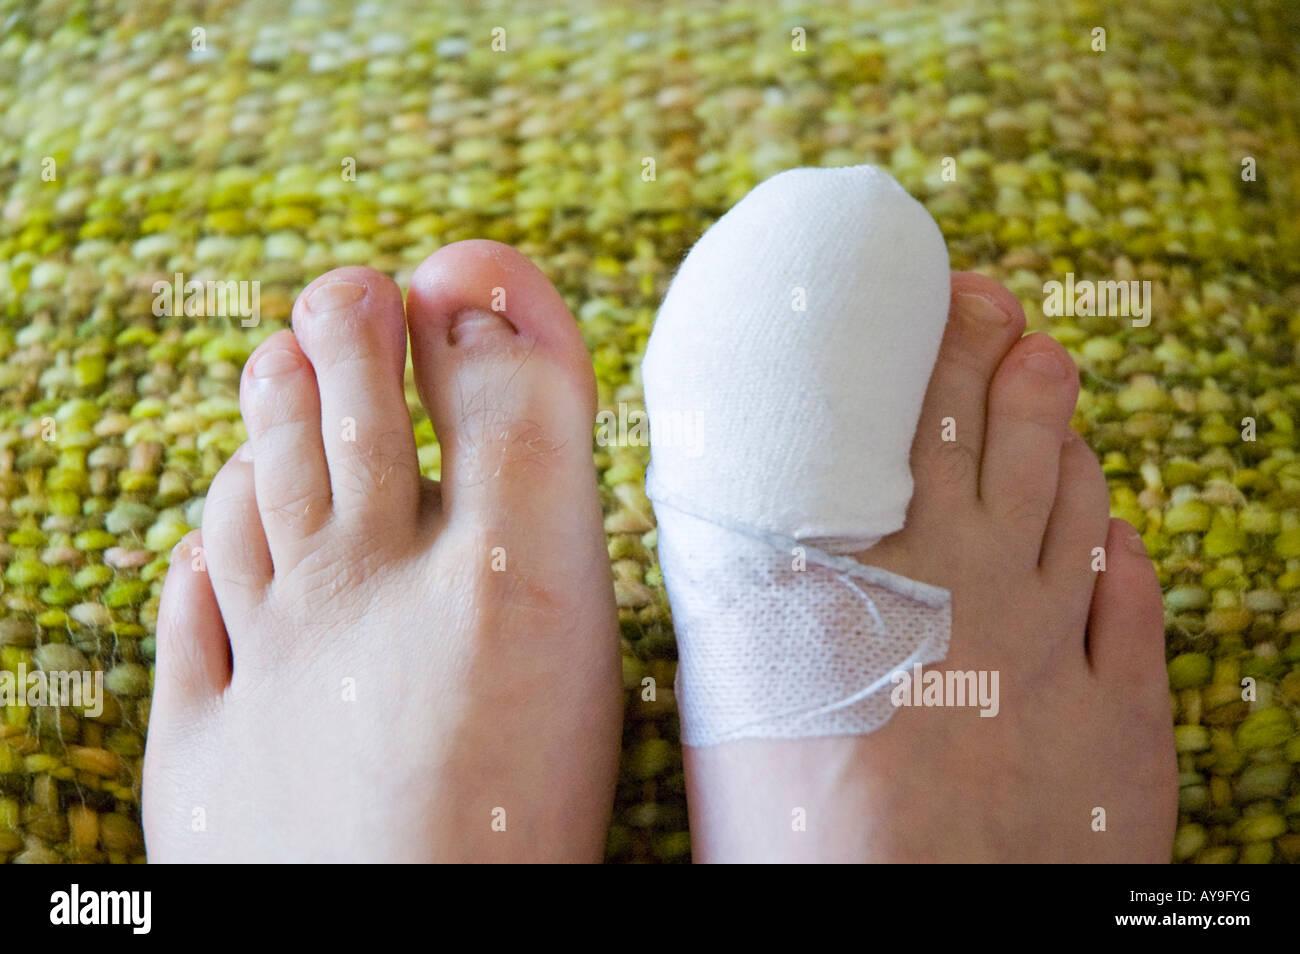 Bandaged toe after toenail removal surgery Stock Photo: 17036979 - Alamy